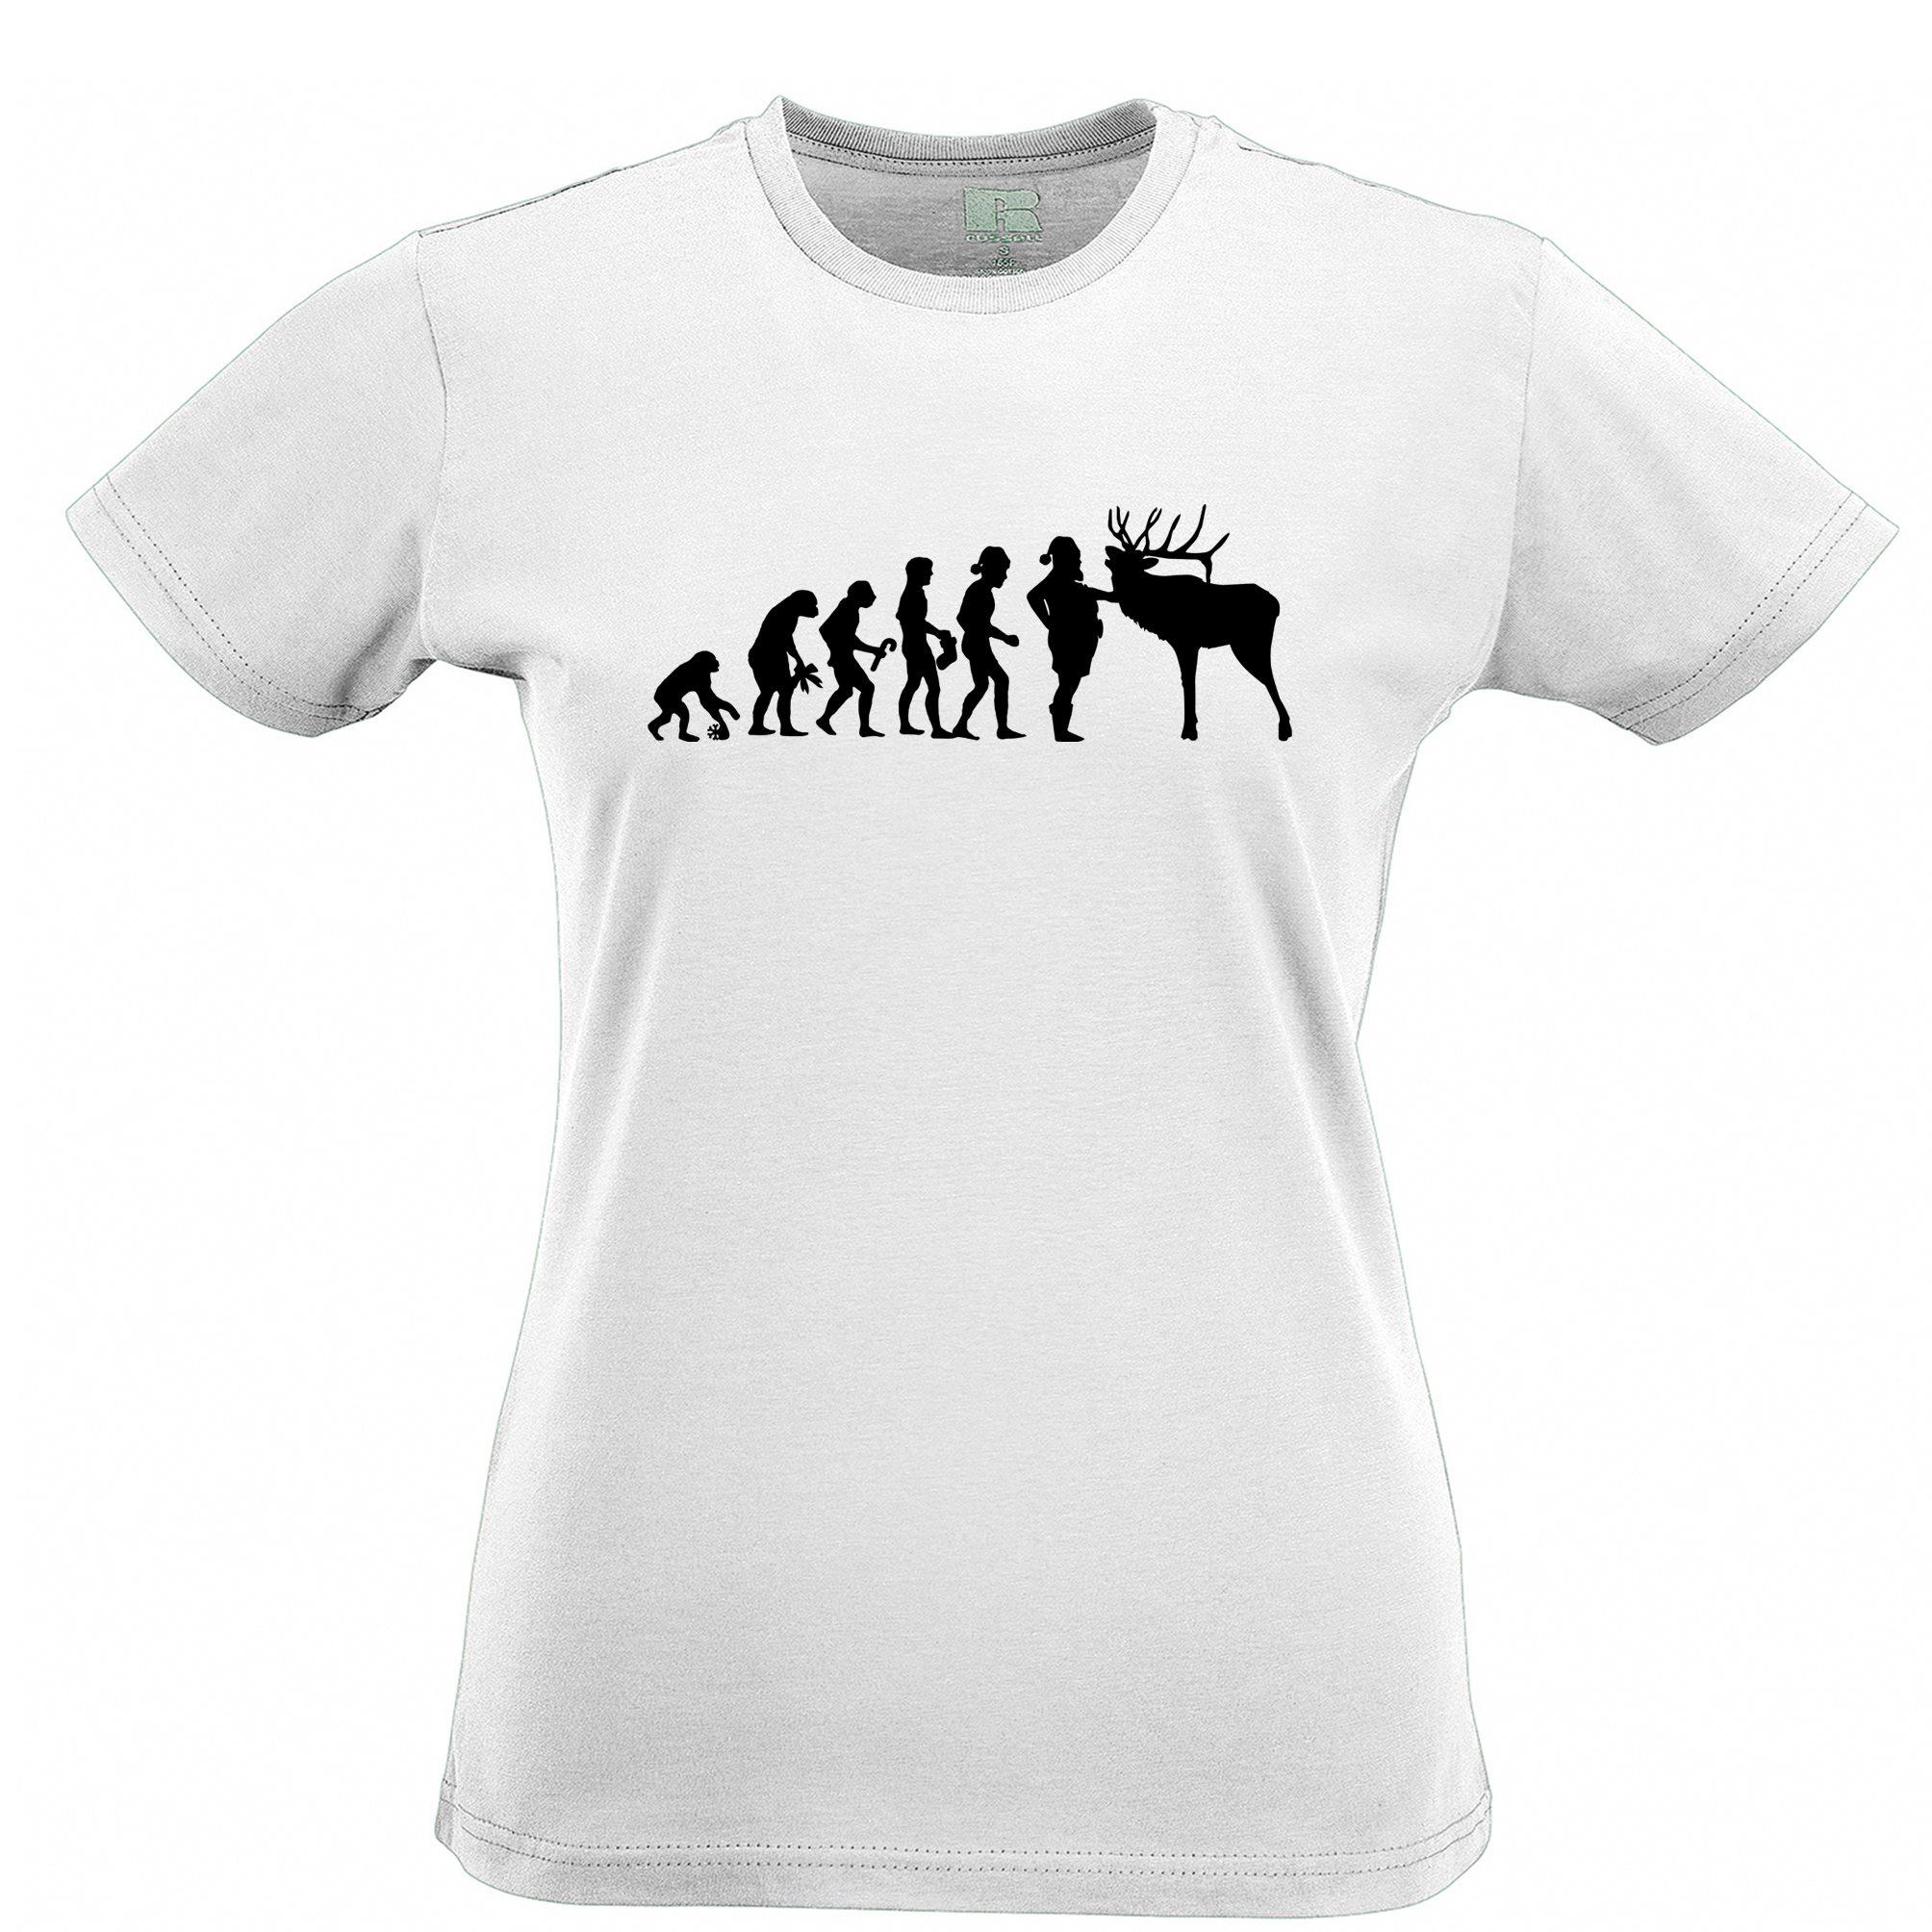 Black t shirt ebay - Evolution Of Christmas Darwin Santa Xmas Present Gift